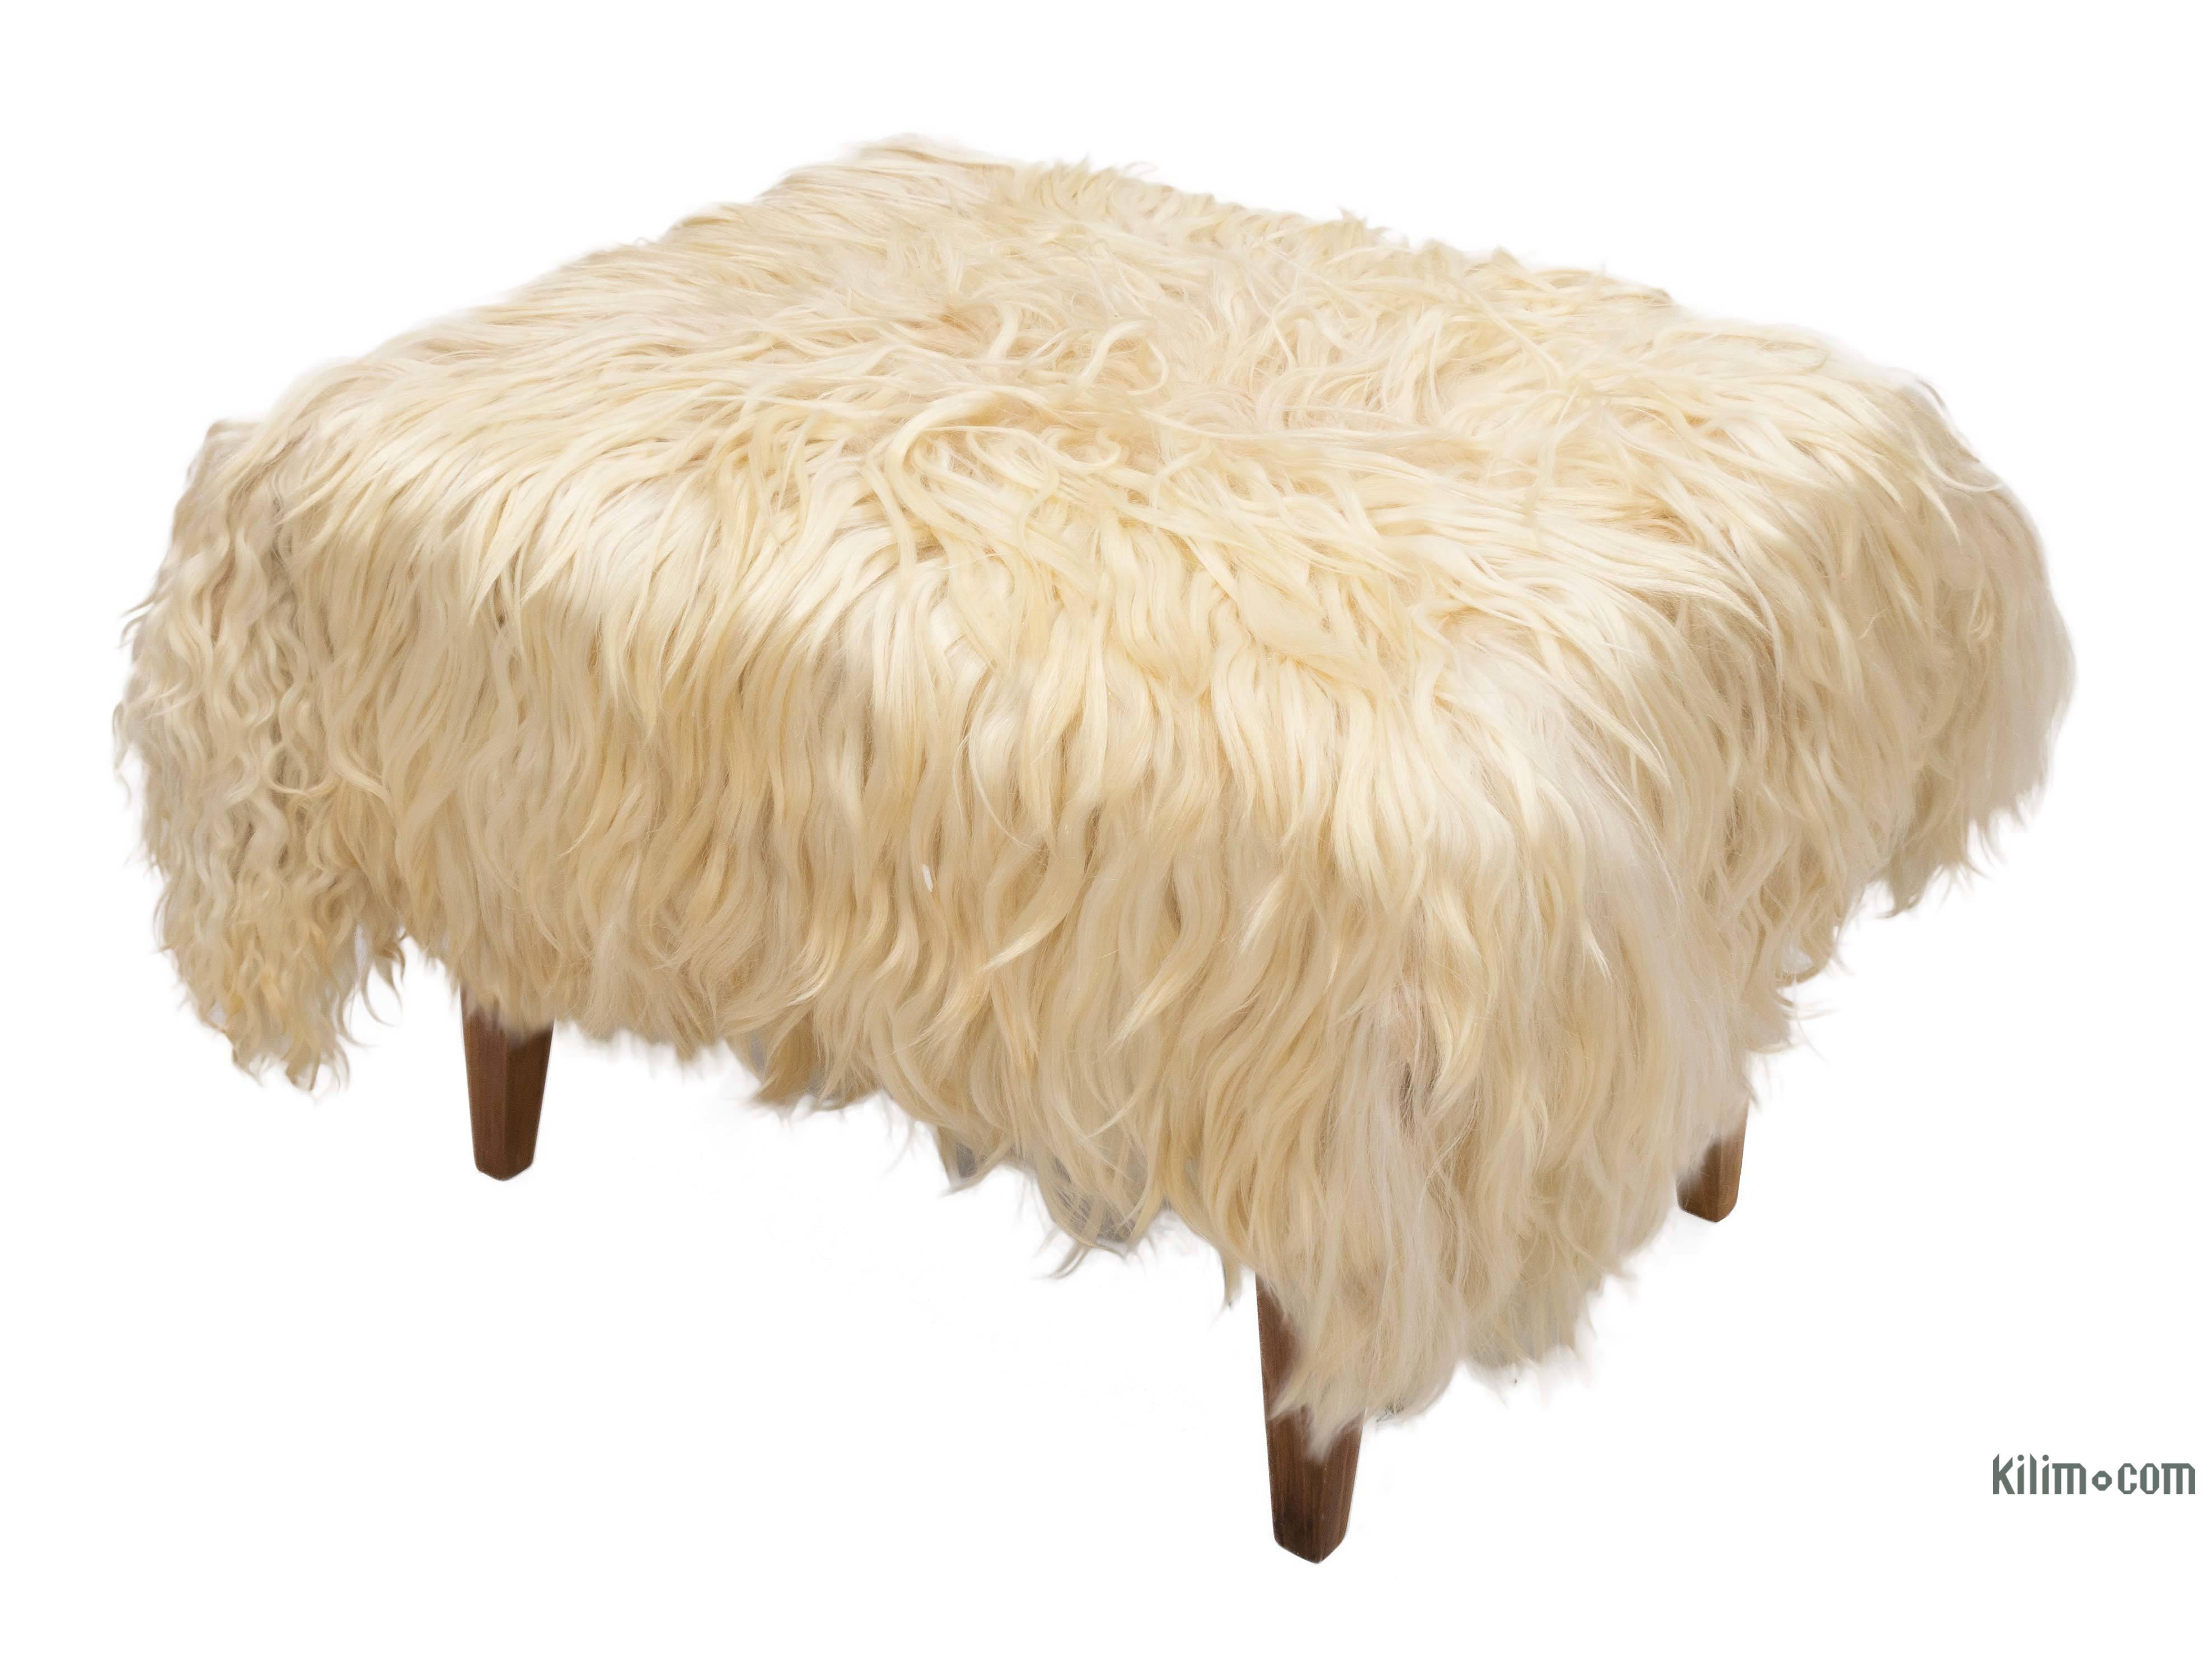 K0034056 Angora Goat Hide Ottoman With Hairpin Legs Kilimcom The